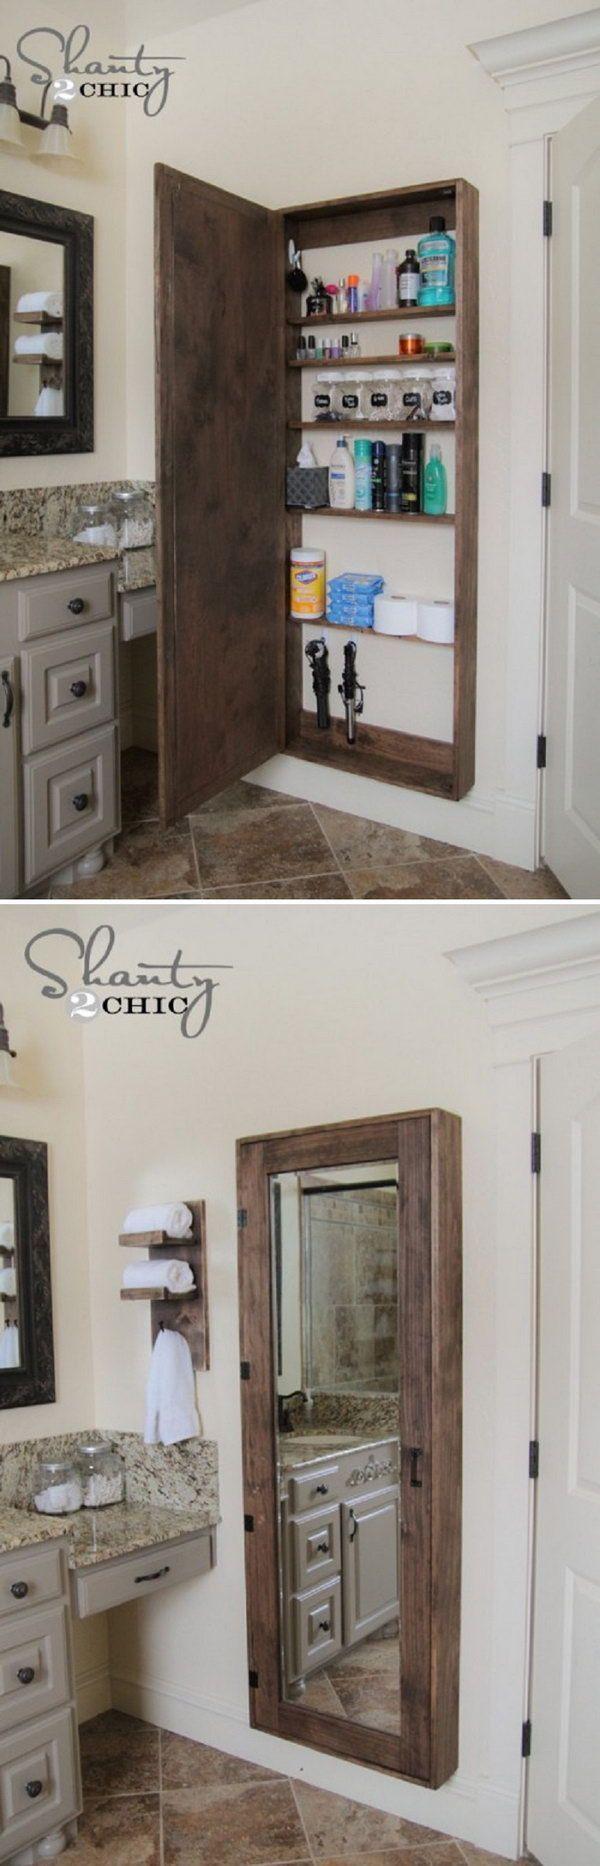 150 Best Innovative Bathroom Storage Ideas For Small Spaces Images Unique Bathroom Storage For Small Spaces Design Ideas